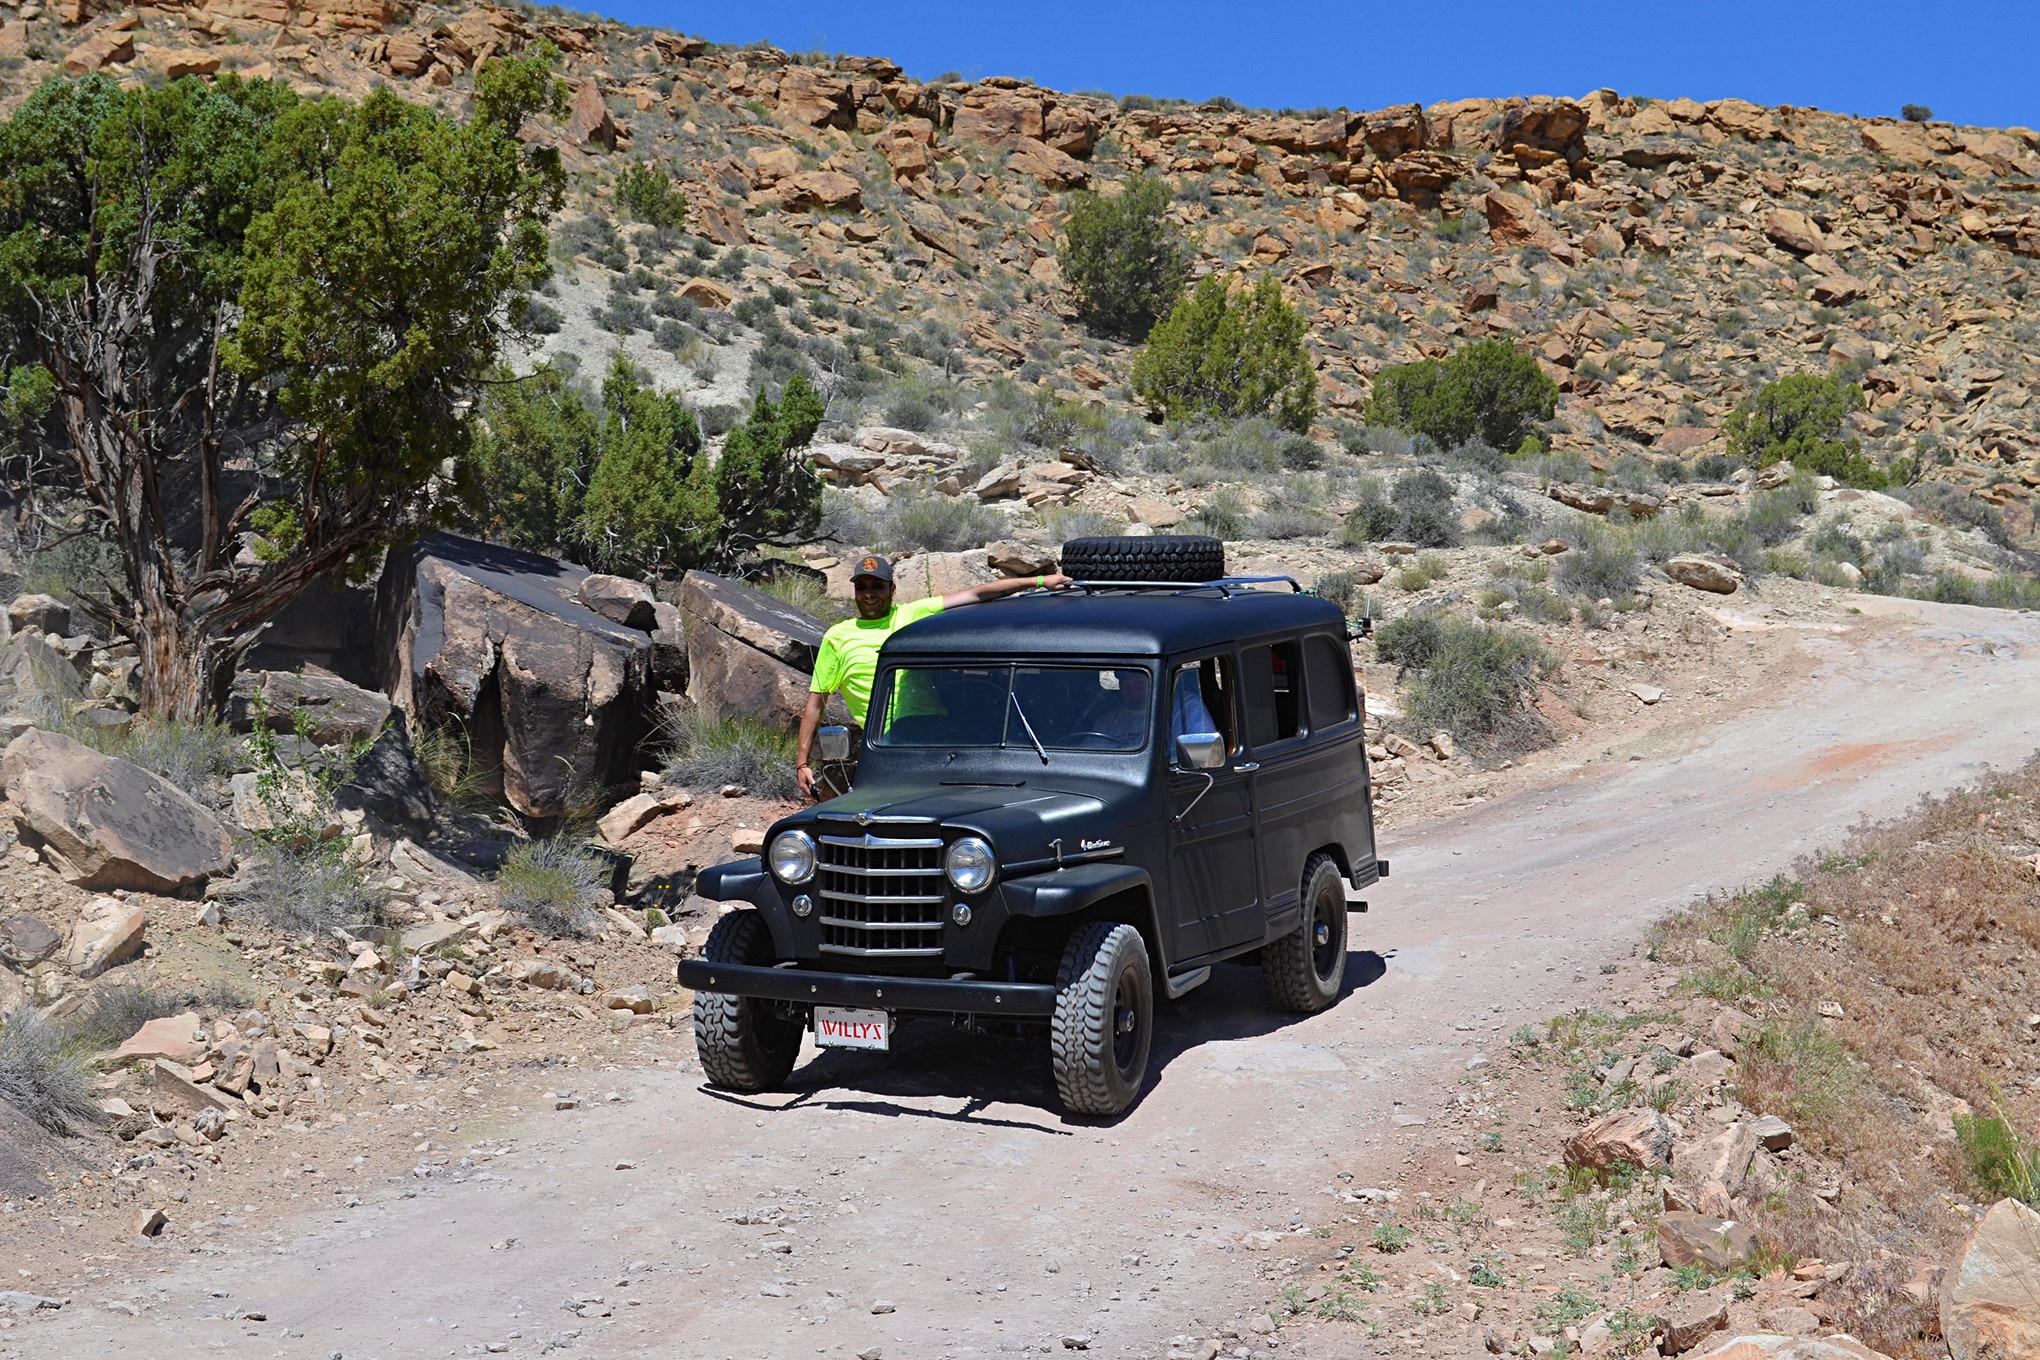 055 willys rally moab 2018 gallery.JPG